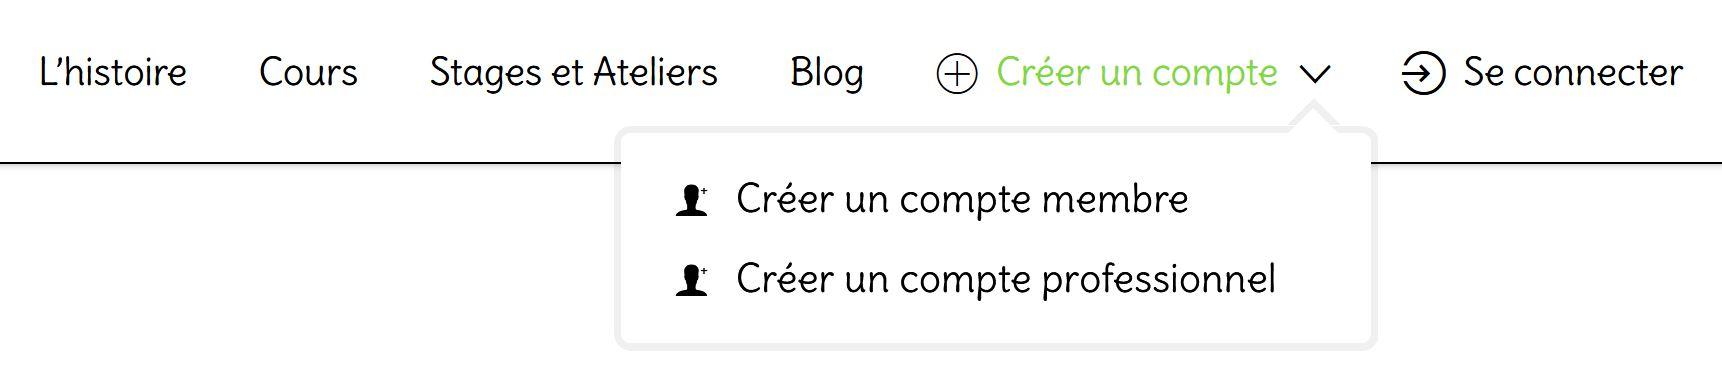 creation_compte_pro